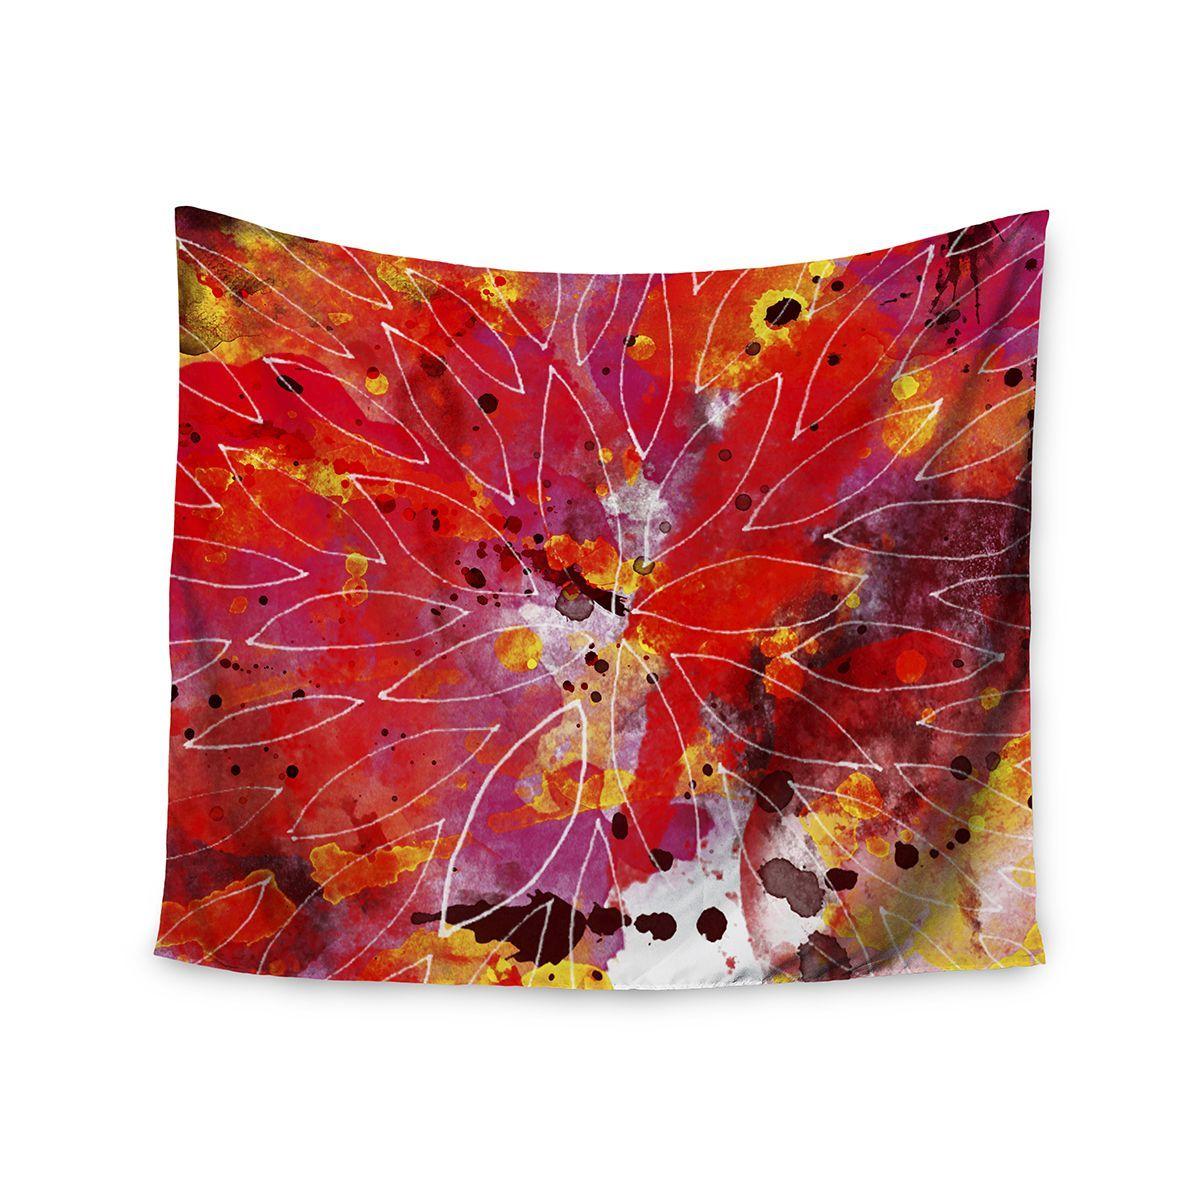 Kess InHouse Li Zamperini 'Flame' Yellow 51x60-inch Tapestry